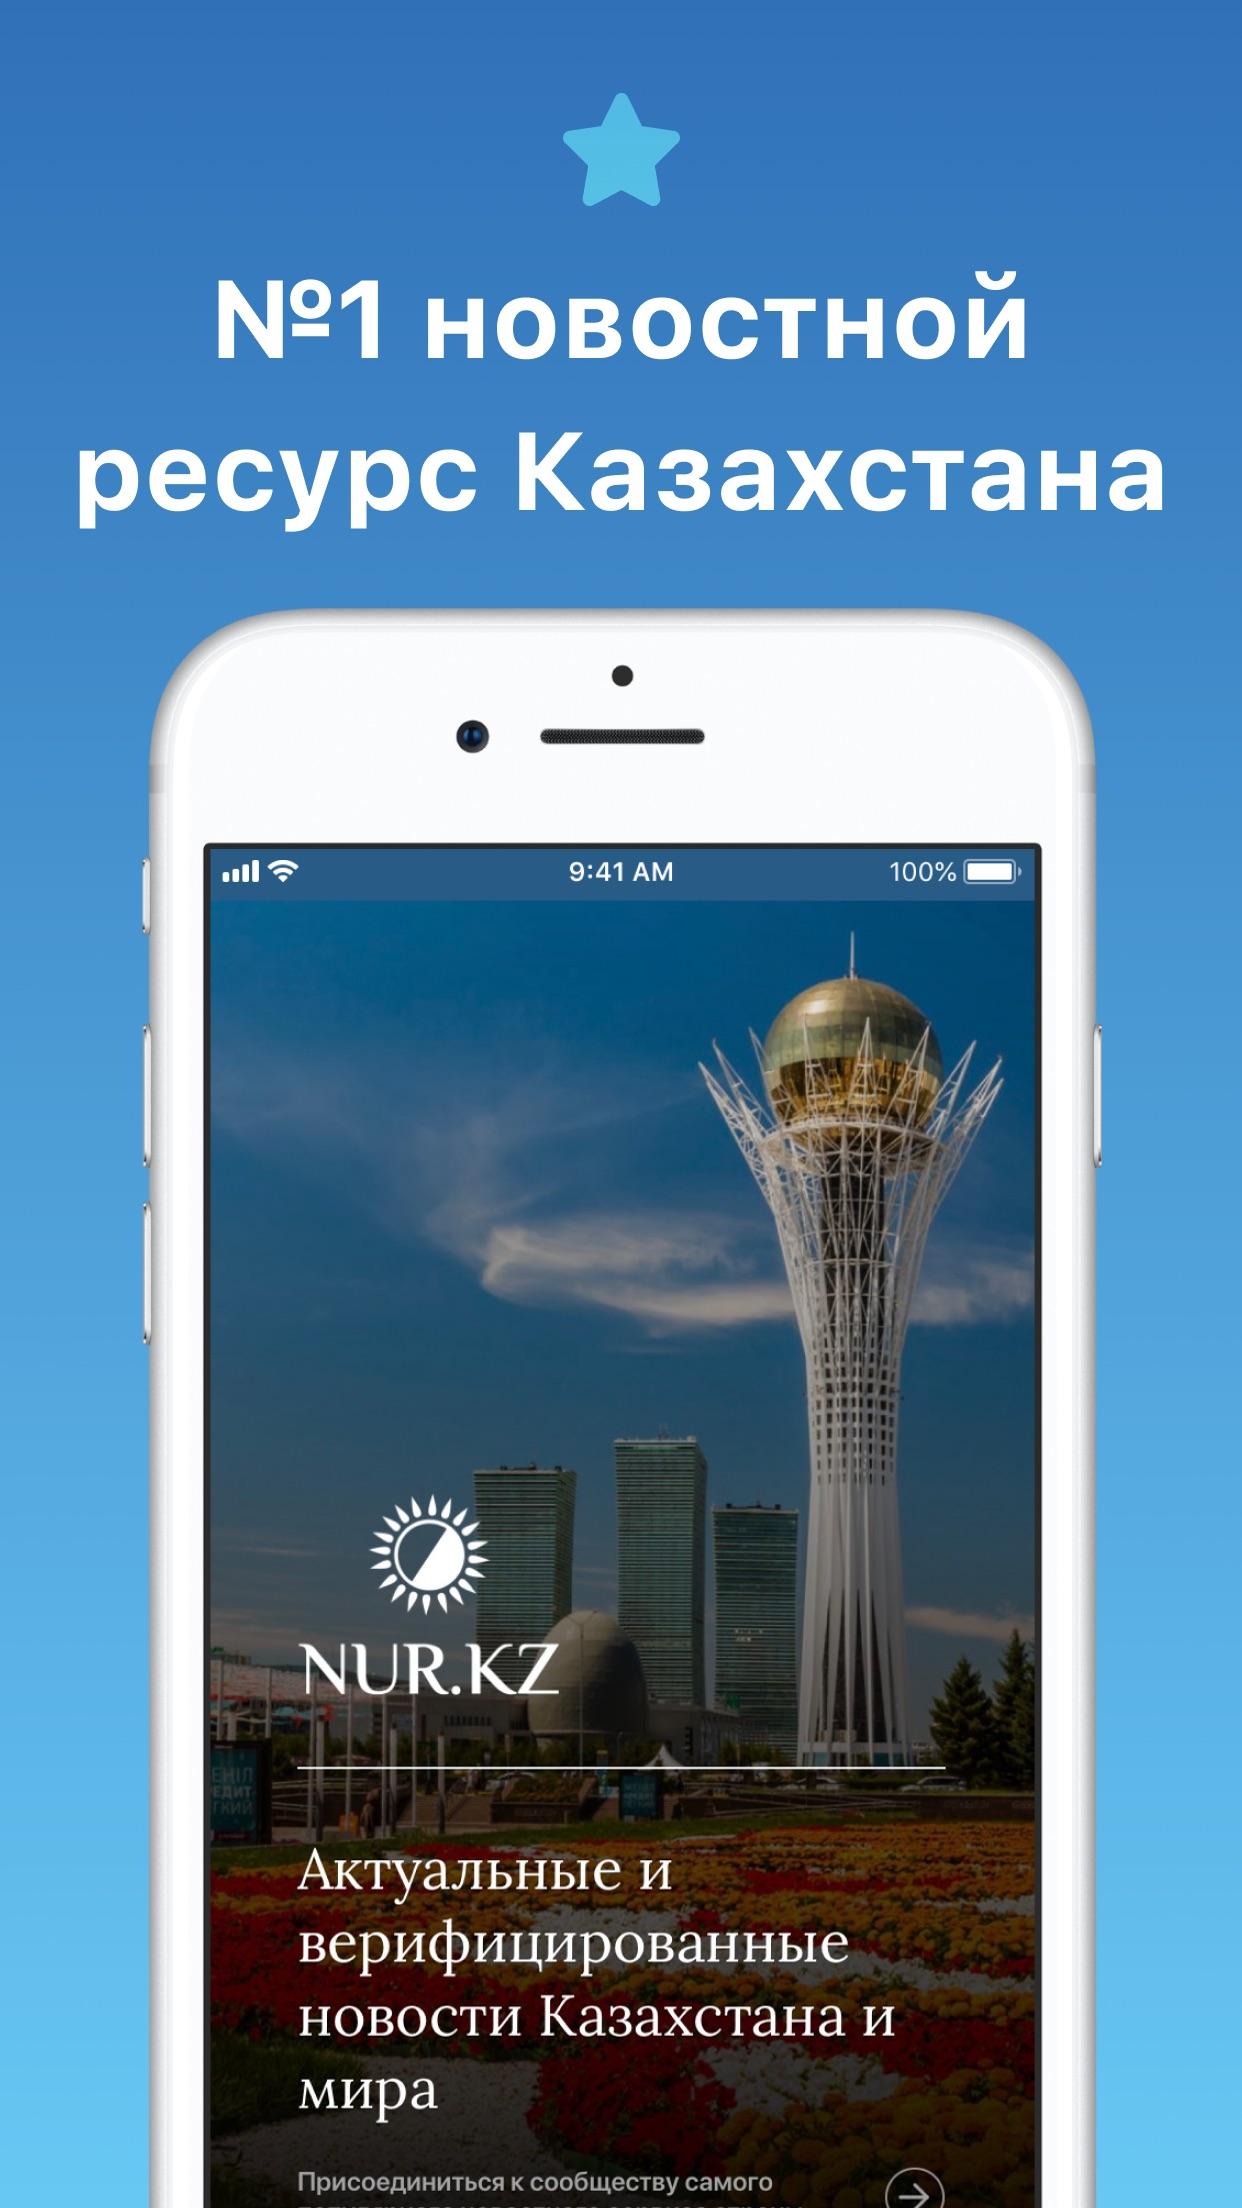 NUR.kz - Новости Казахстана Screenshot